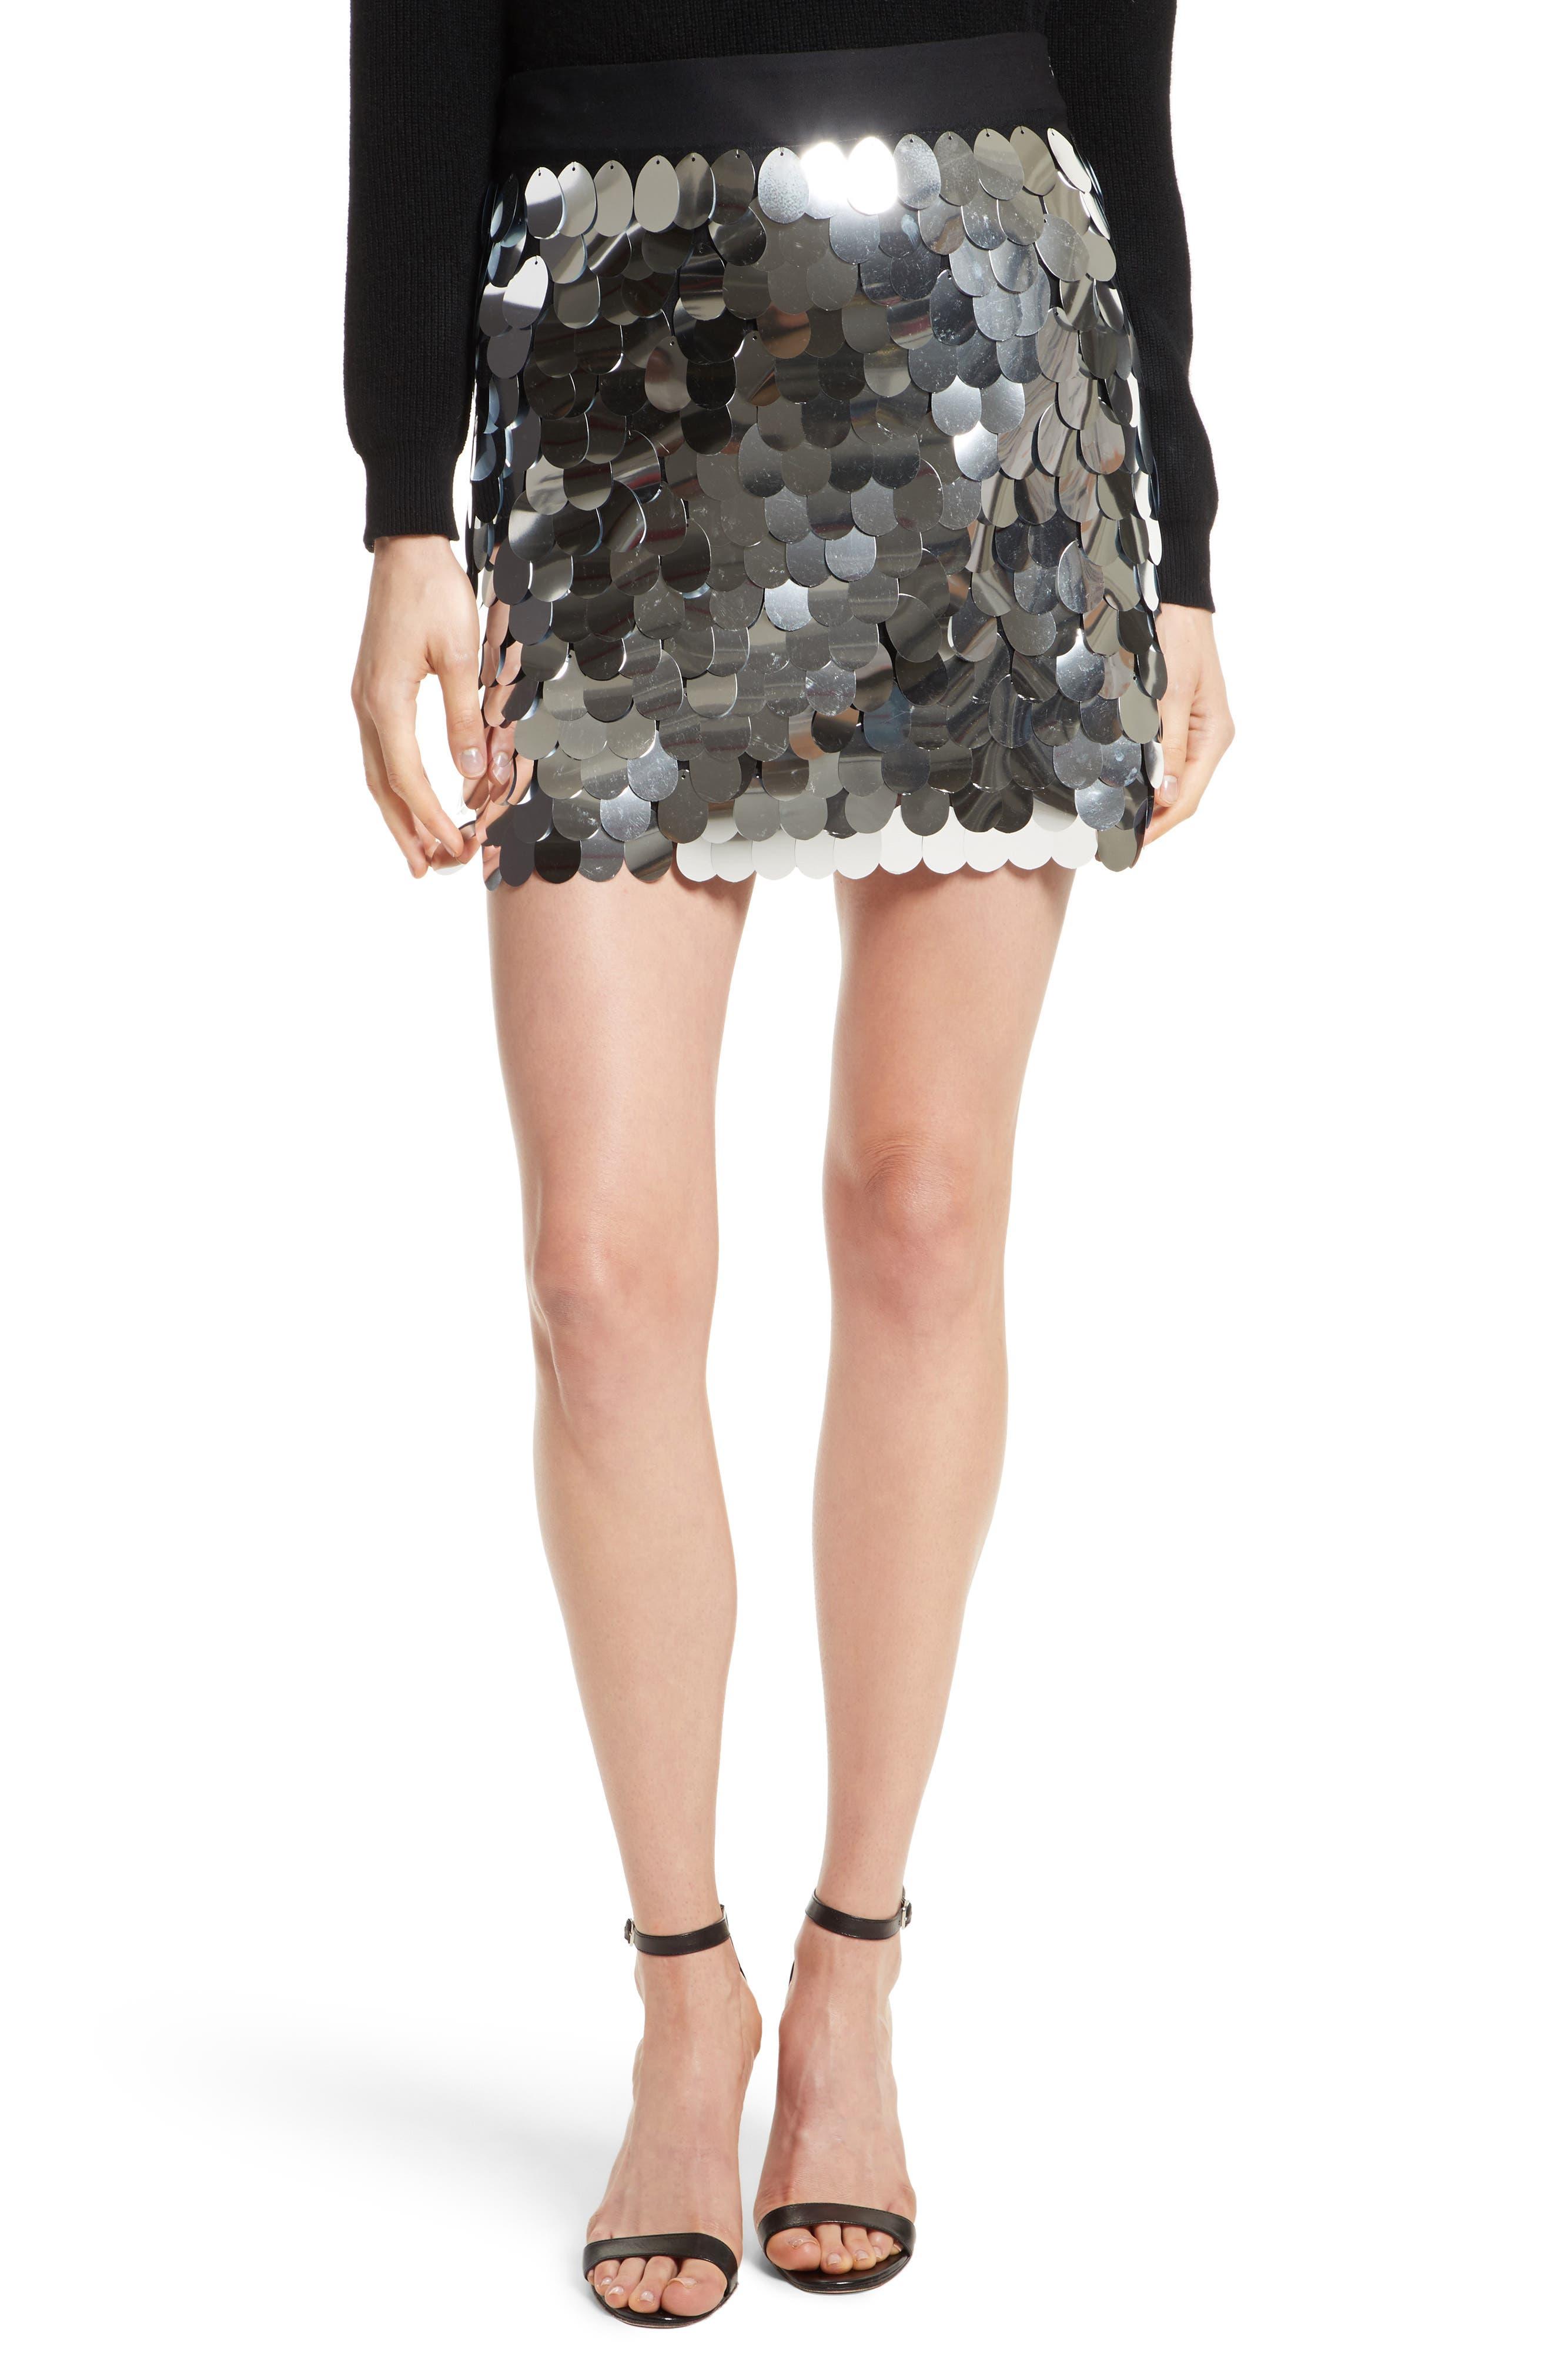 Milly Paillette Sequin Miniskirt